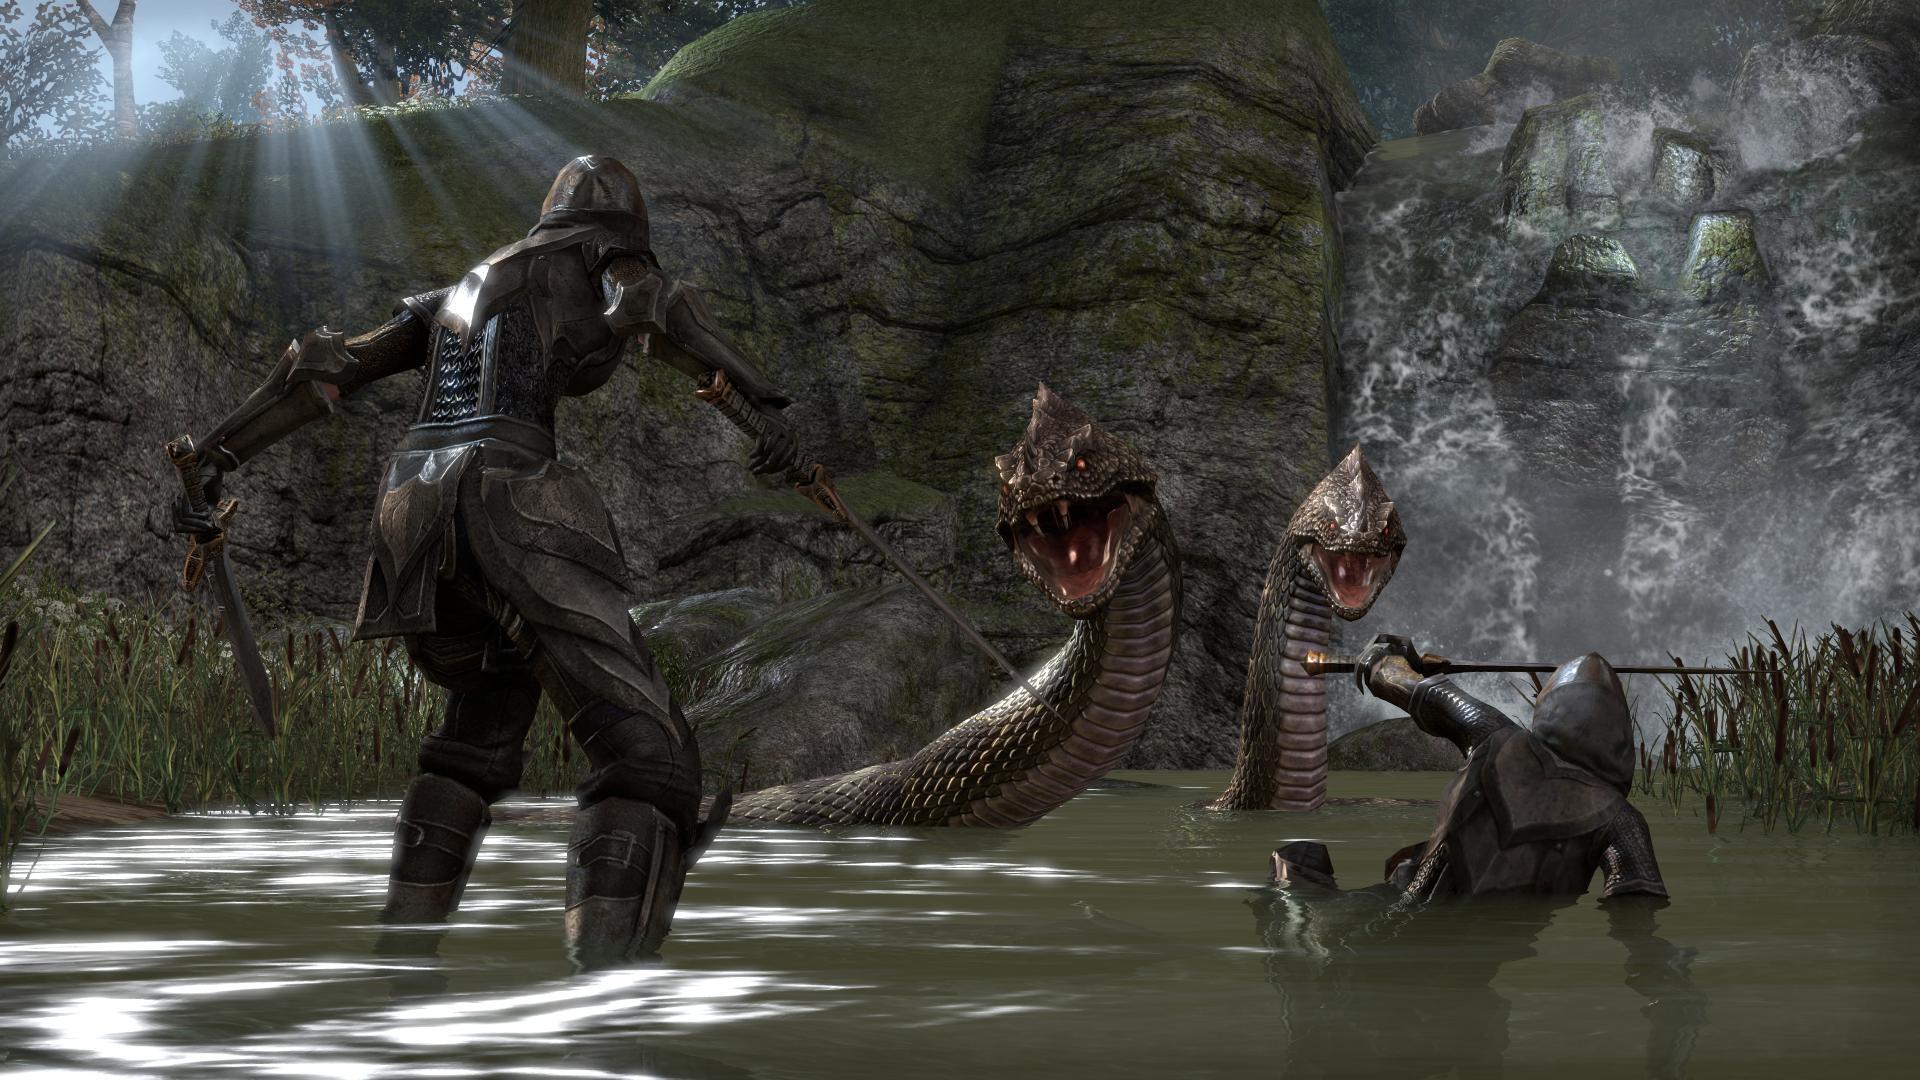 Geoff Keighley Shares Game Awards Billboard Advertising New Elder Scrolls Online News